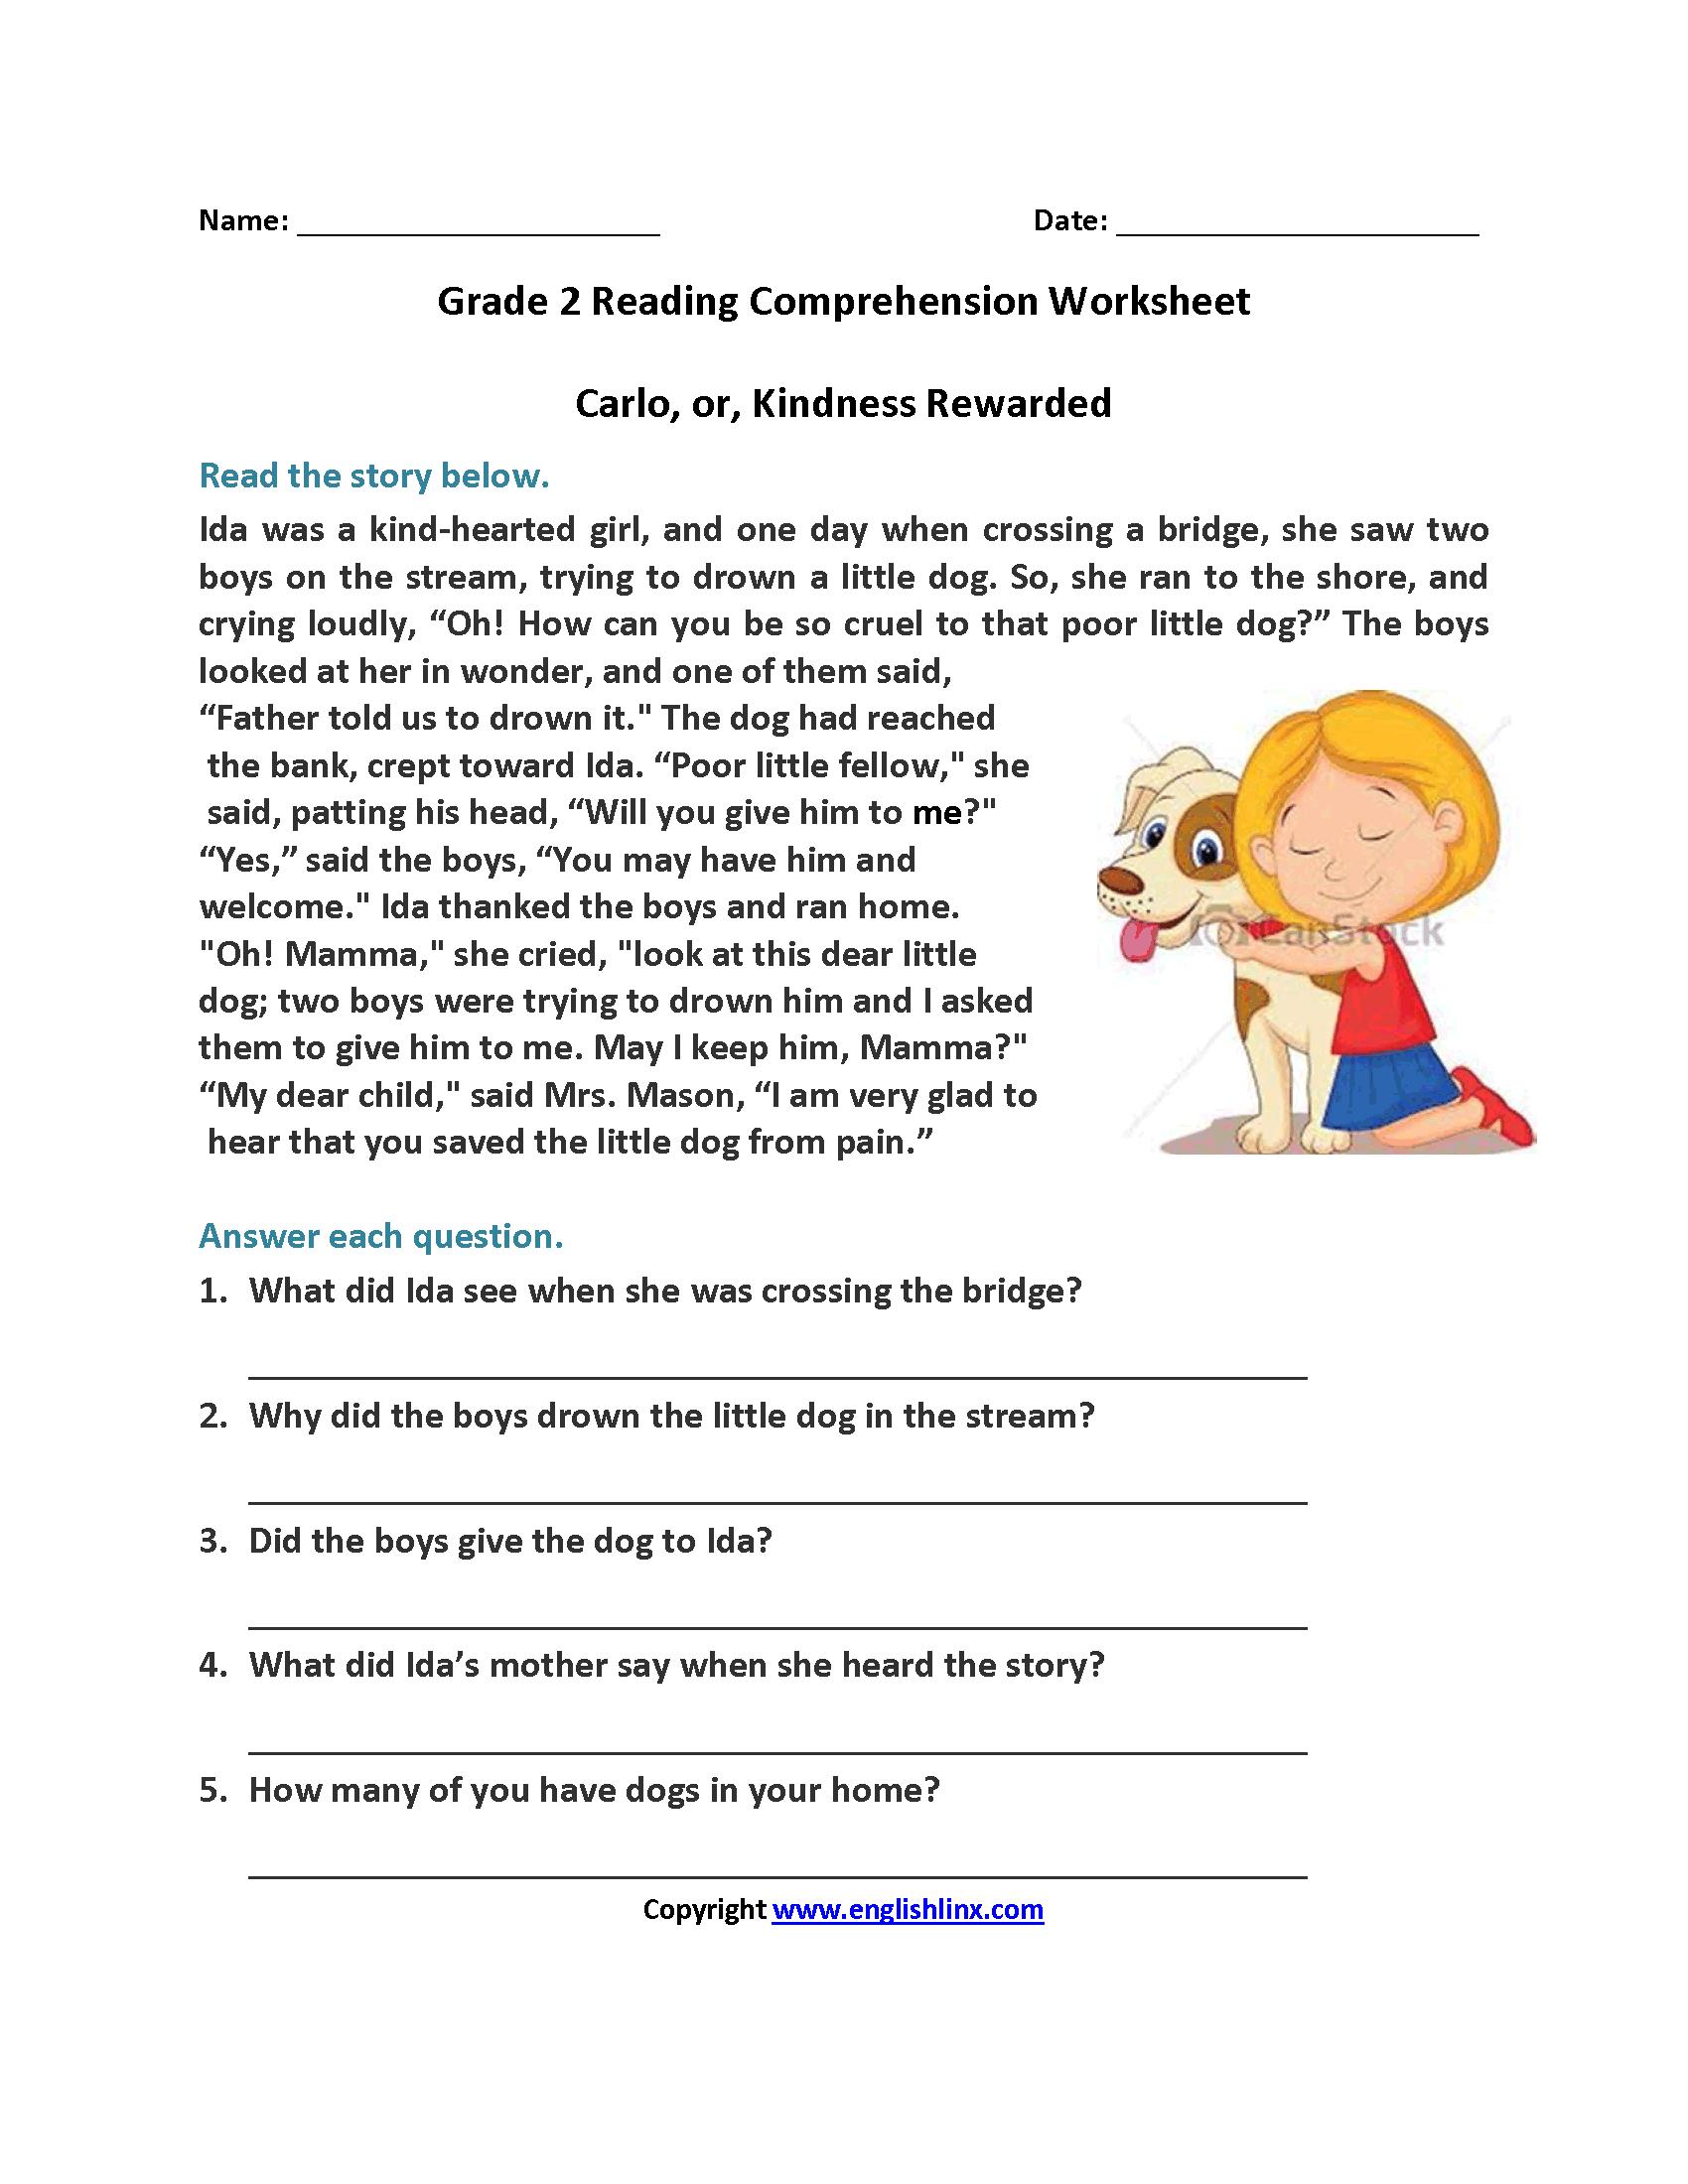 Carlo Or Kindness Rewarded Second Grade Reading Worksheets   Reading - Free Printable Hindi Comprehension Worksheets For Grade 3